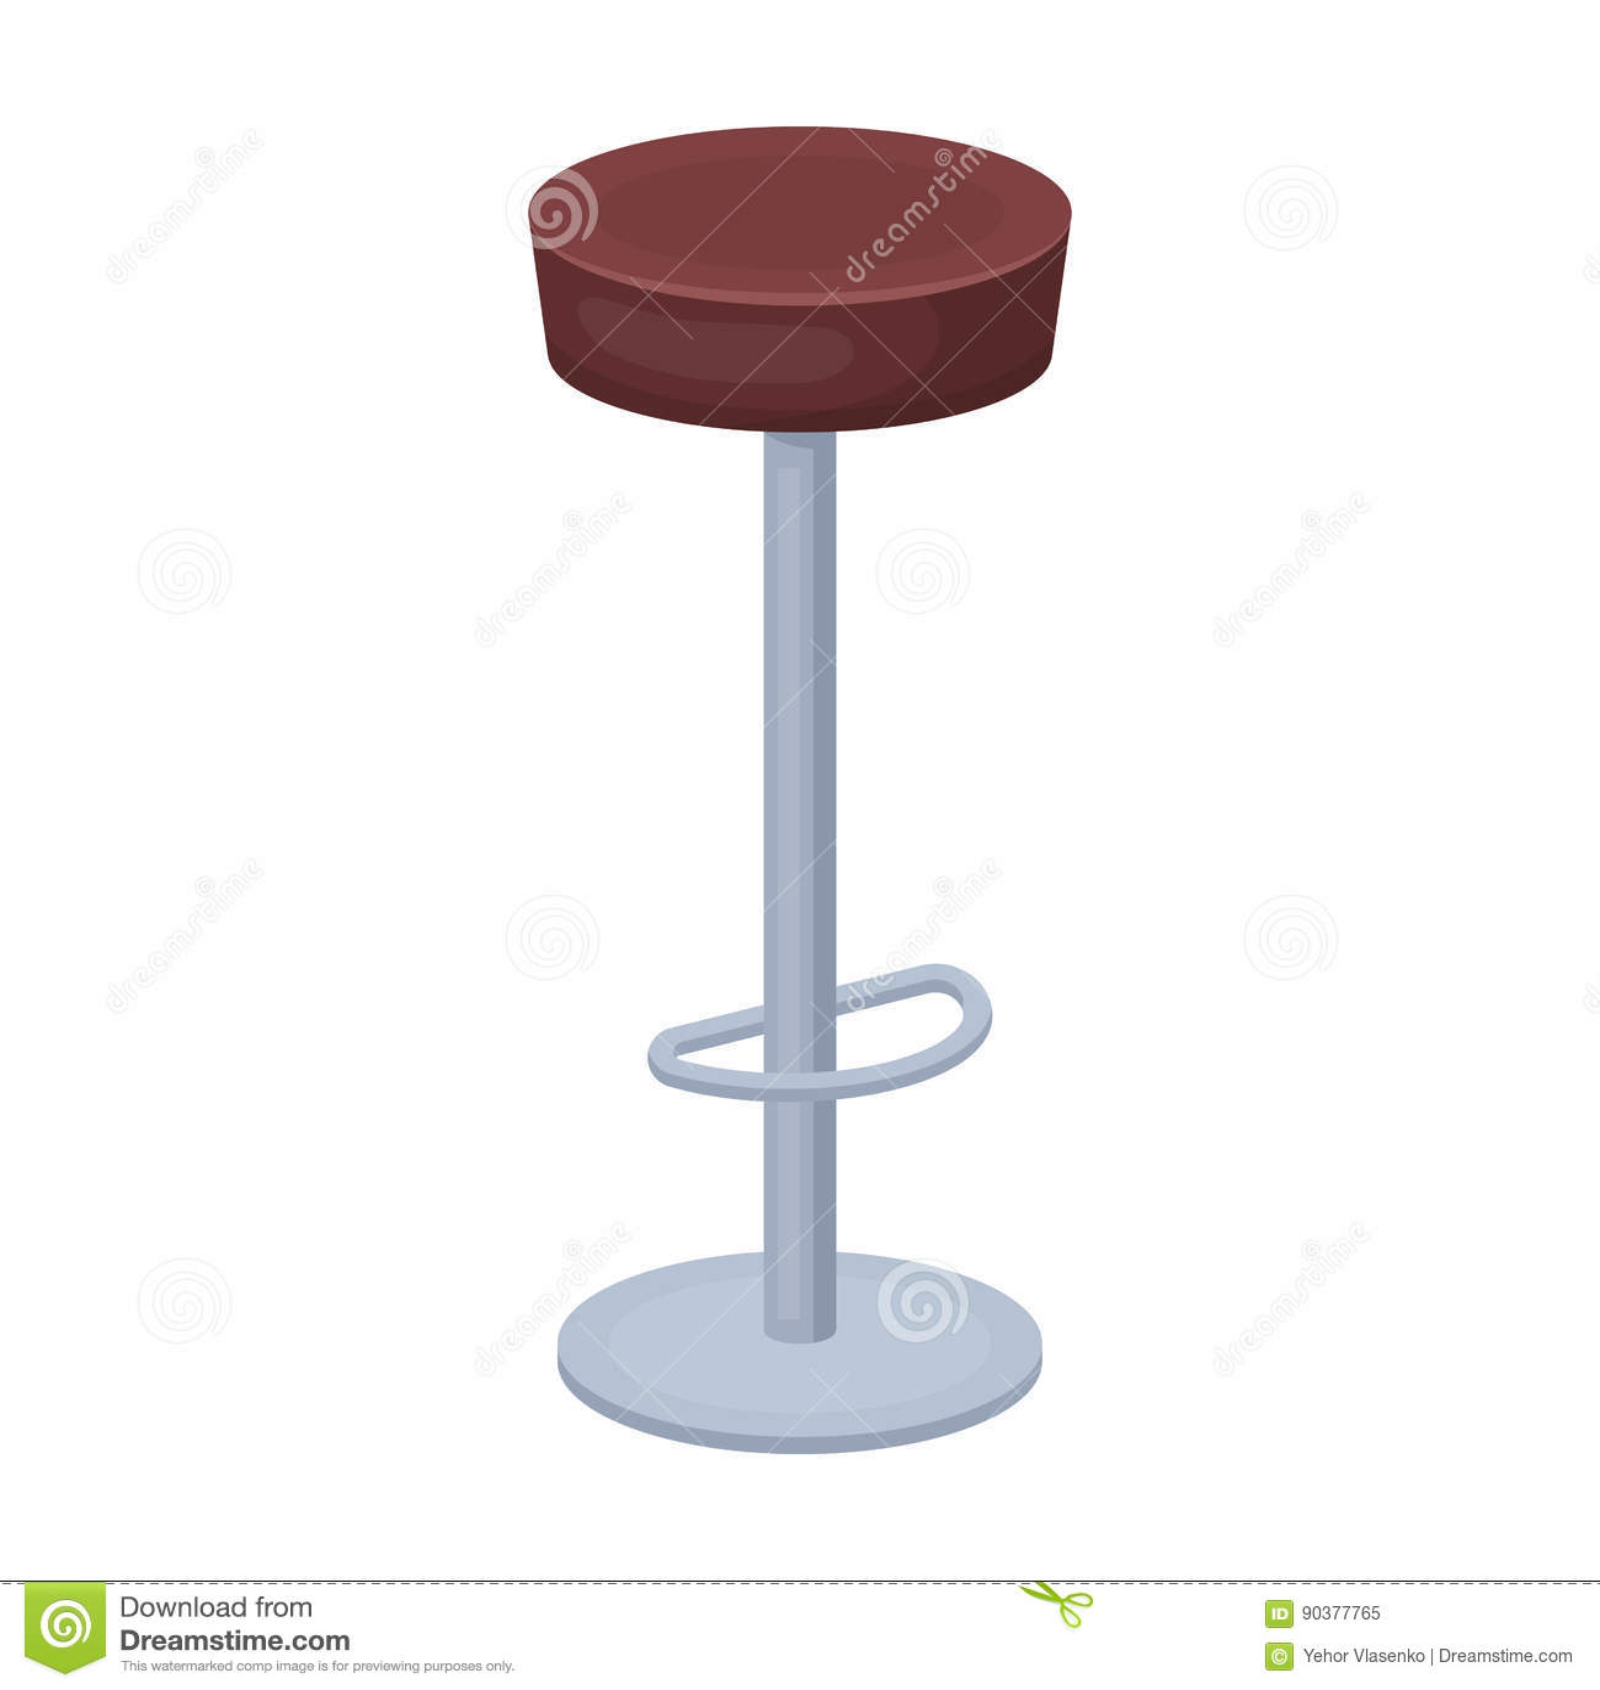 High Chair Seat Near The Bar Bary Chair To Relax Pub Single Icon